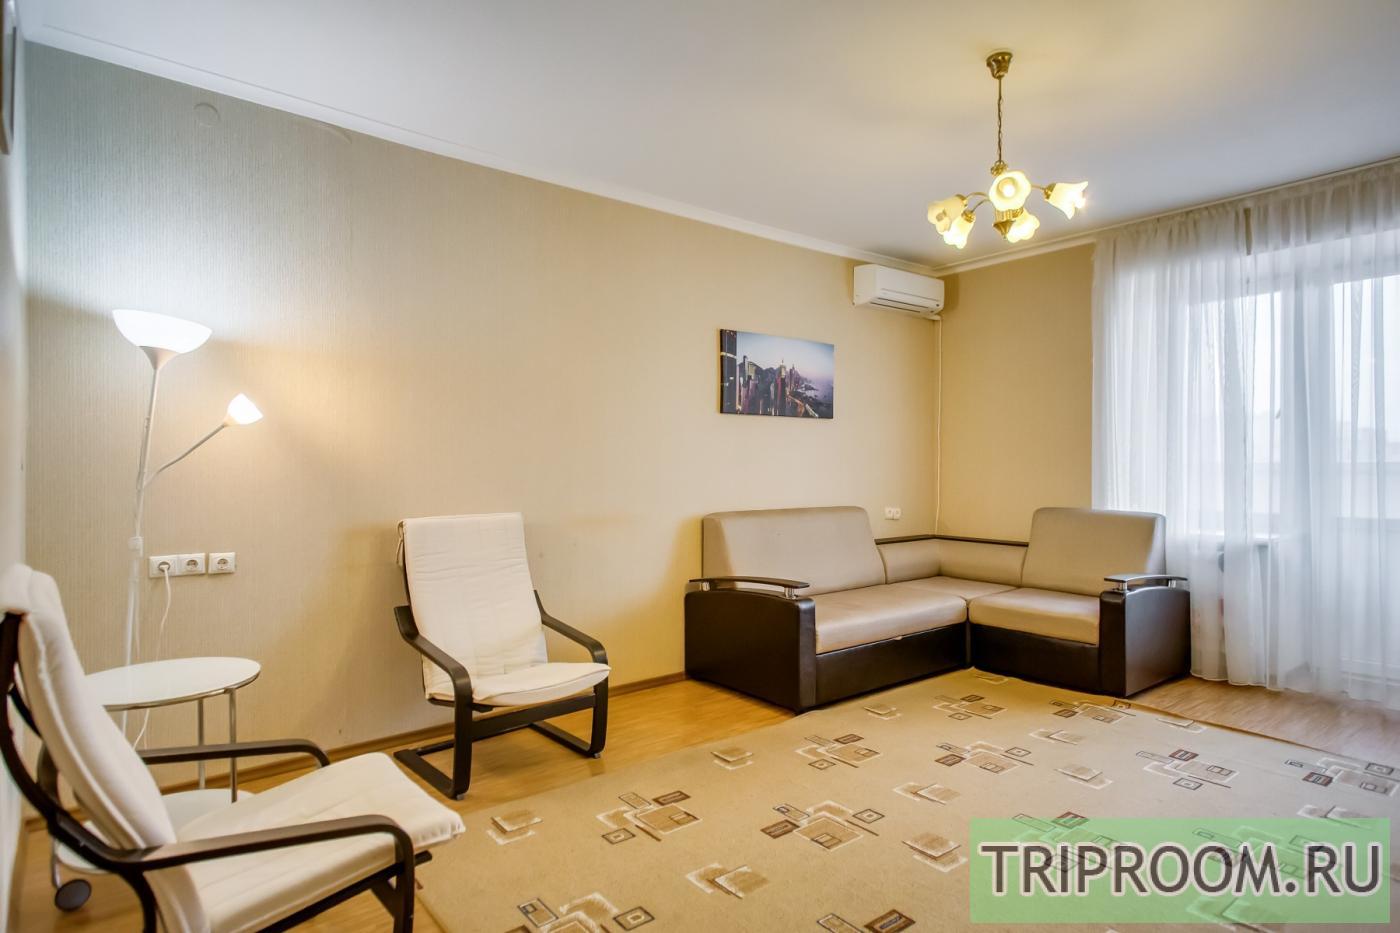 2-комнатная квартира посуточно (вариант № 23730), ул. Максима Горького улица, фото № 7